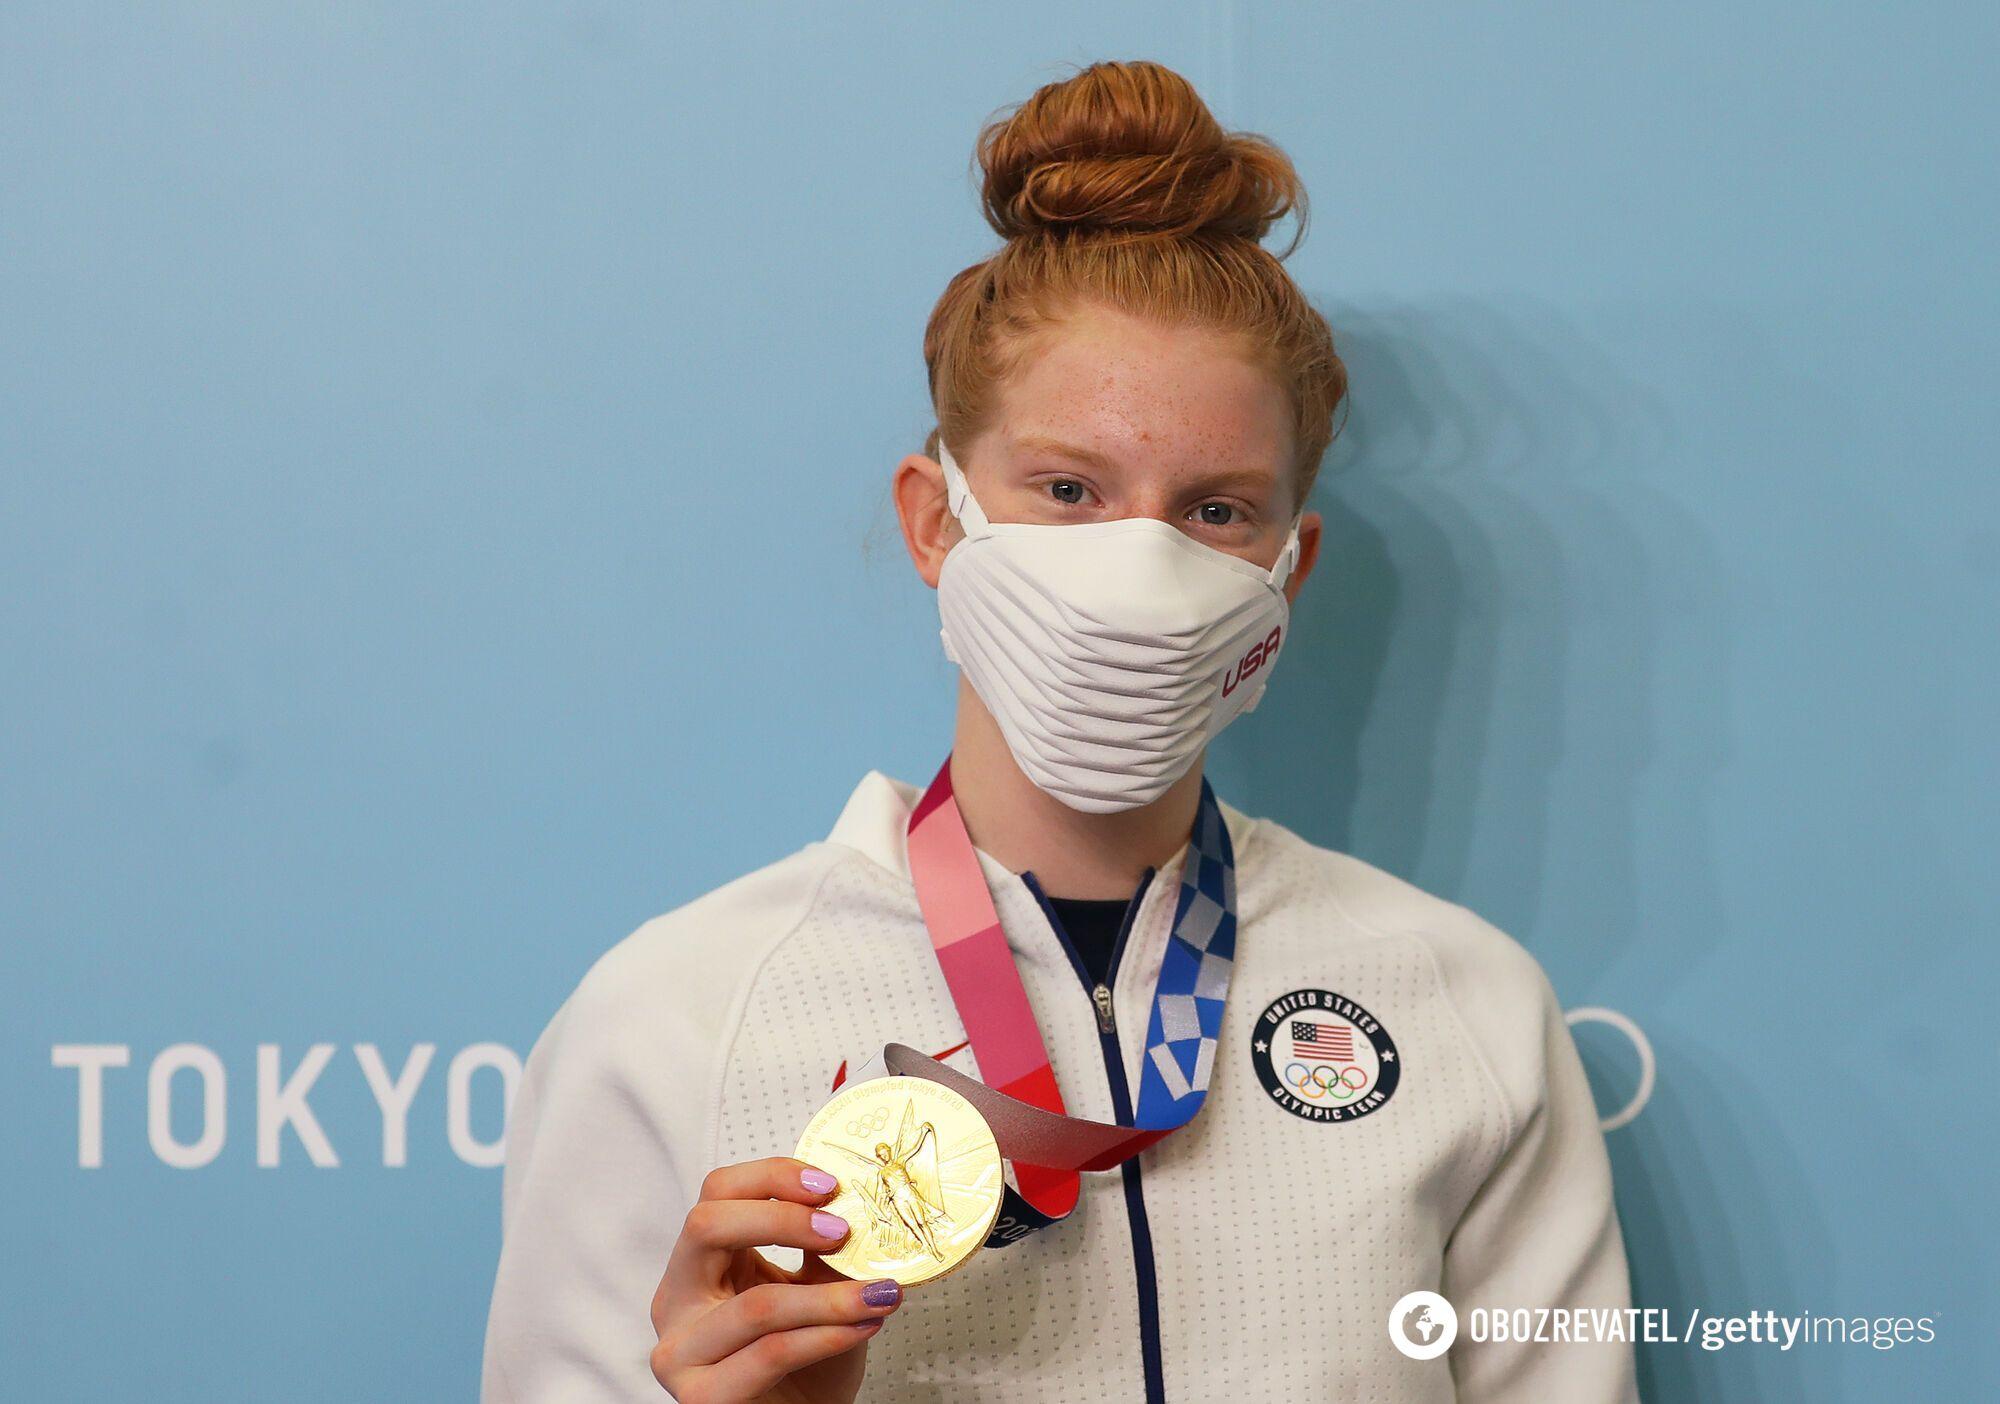 Американская пловчиха Лидия Джейкоби